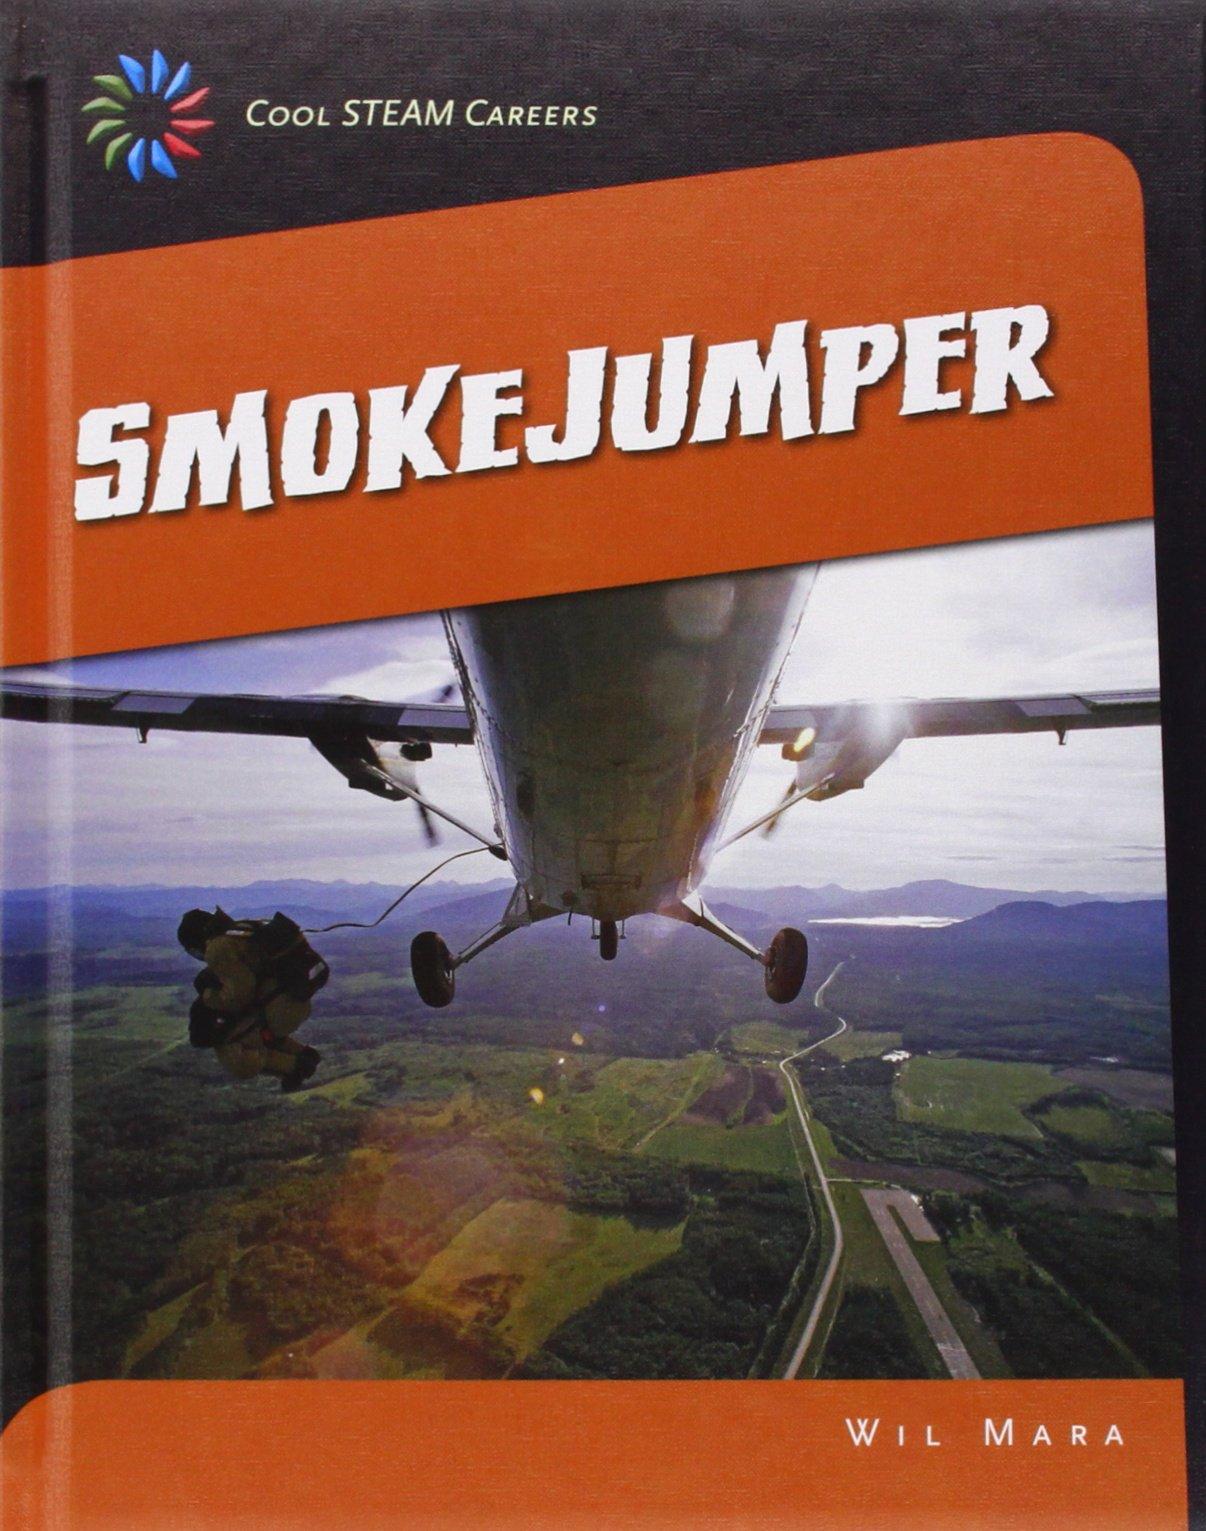 Smokejumper (21st Century Skills Library: Cool Steam Careers) PDF